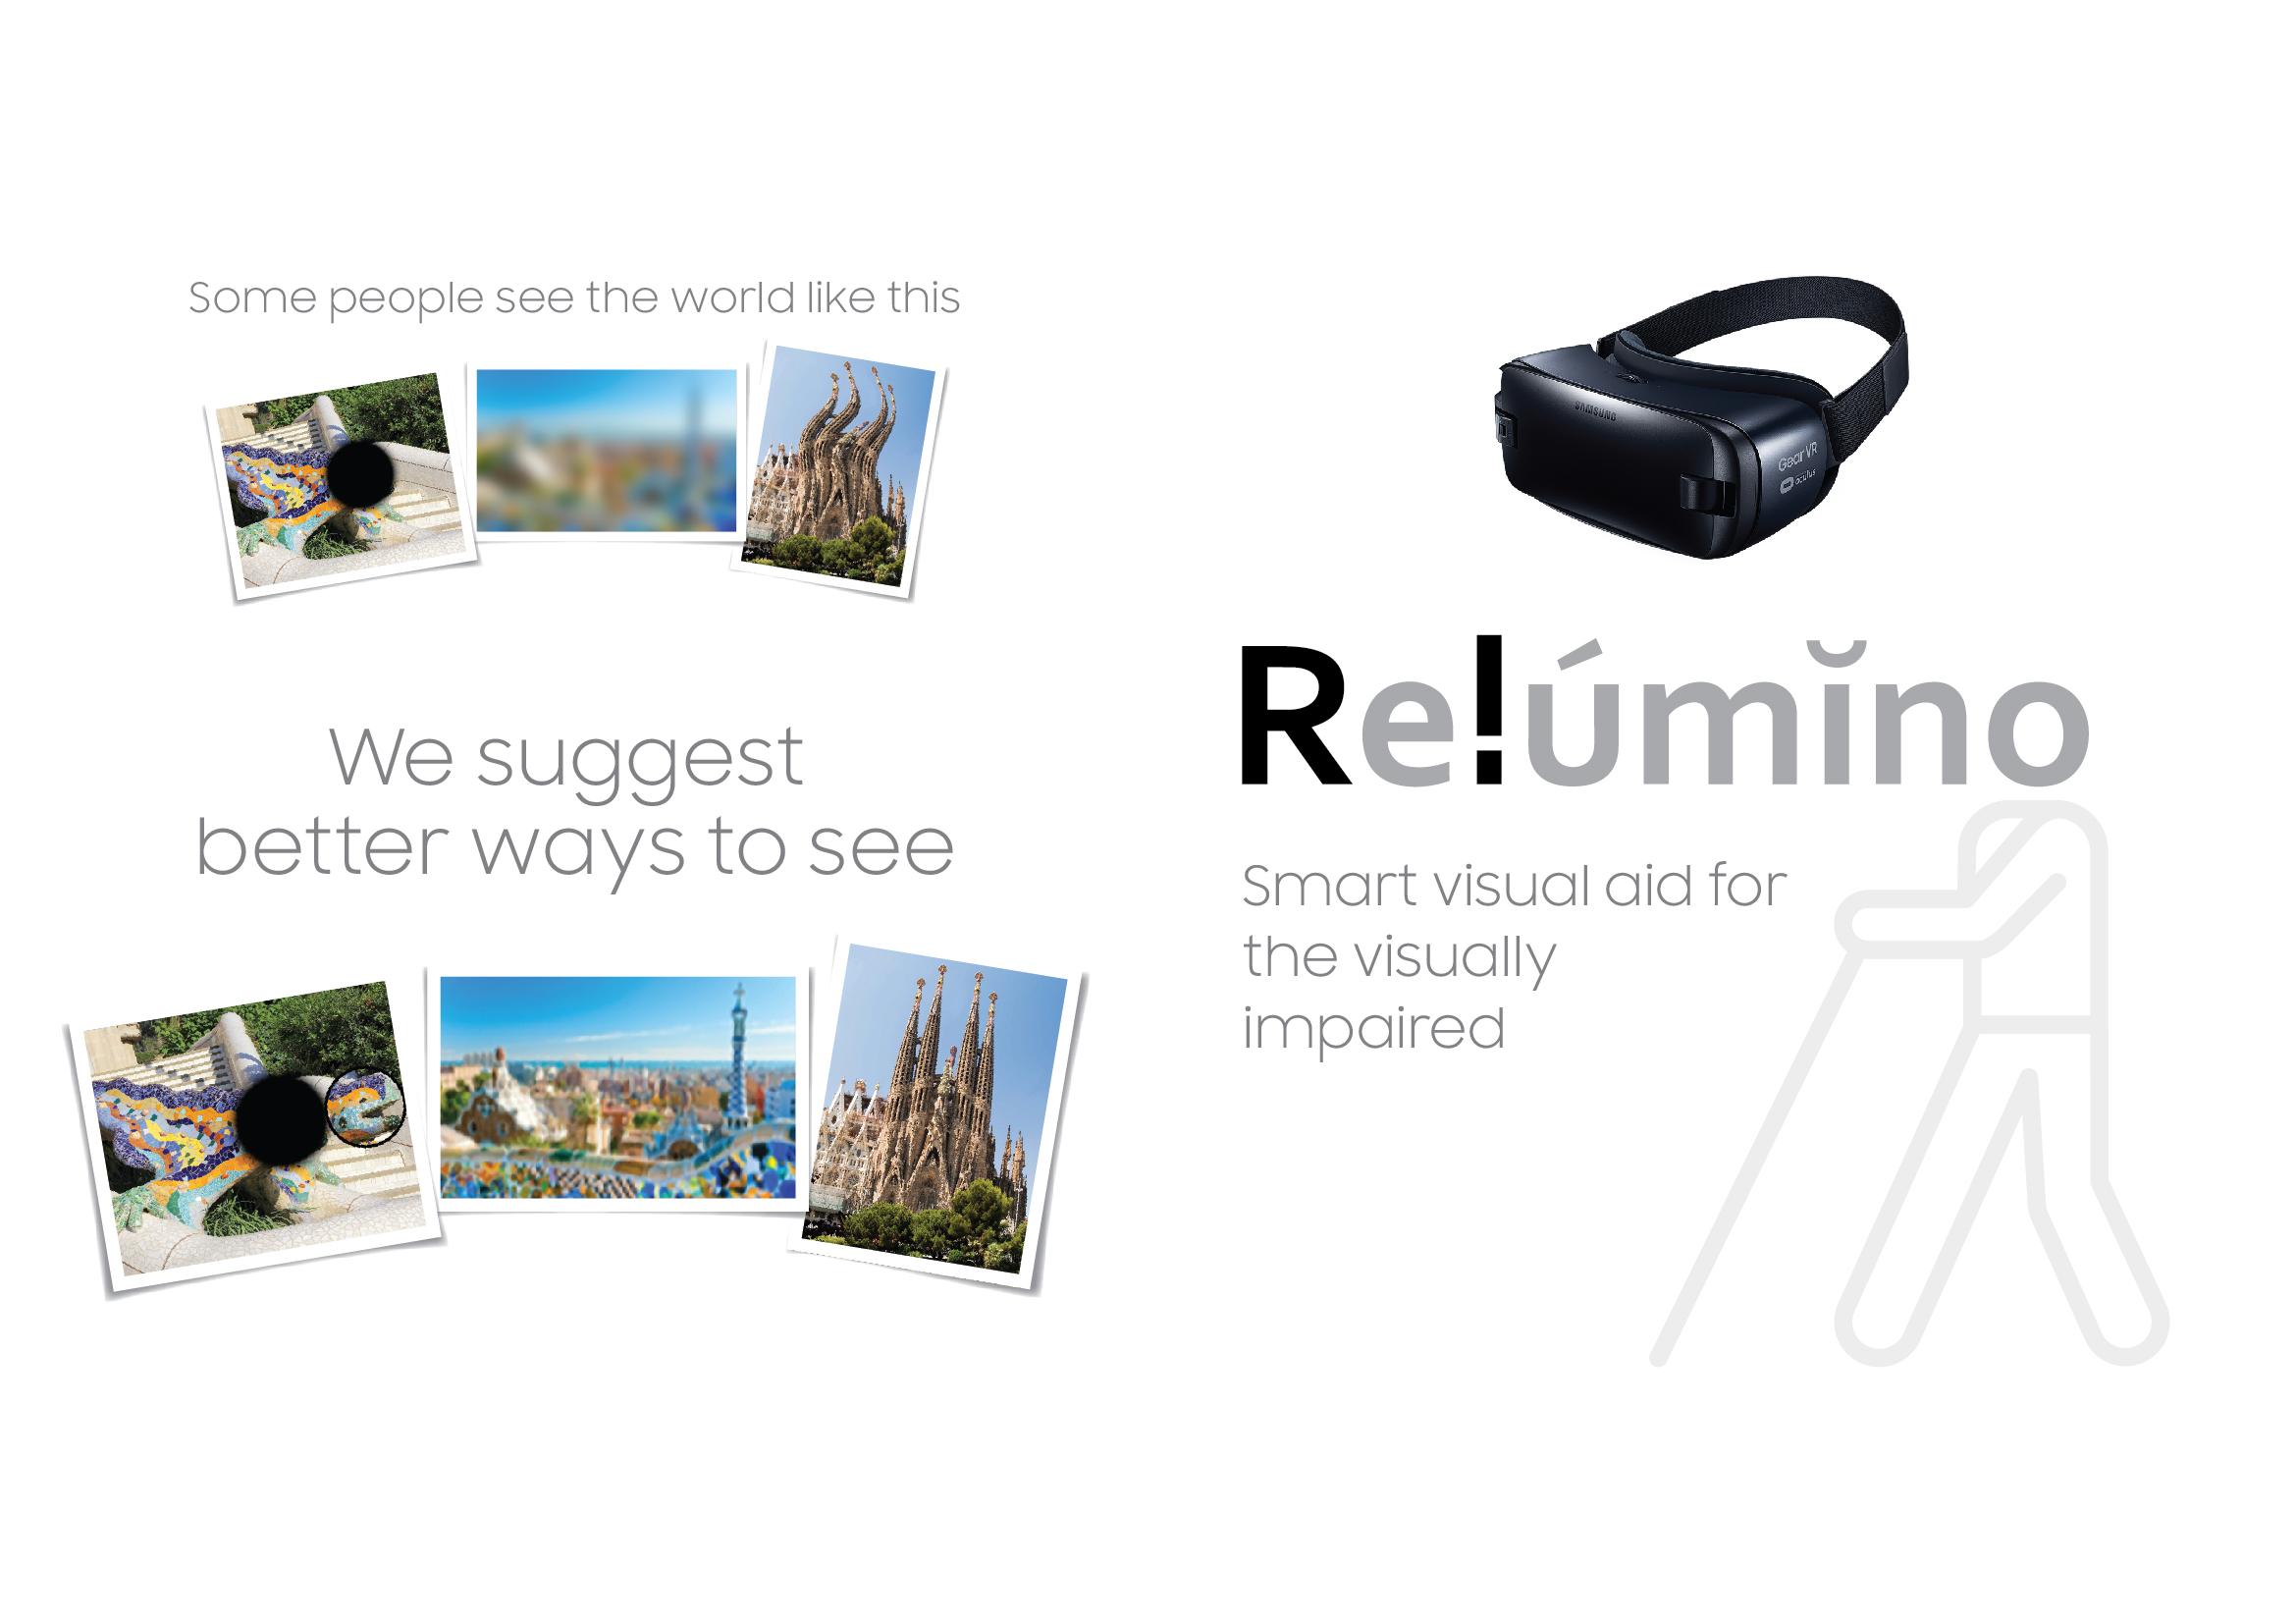 Самсунг покажет VR-проекты навыставке MWC 2017